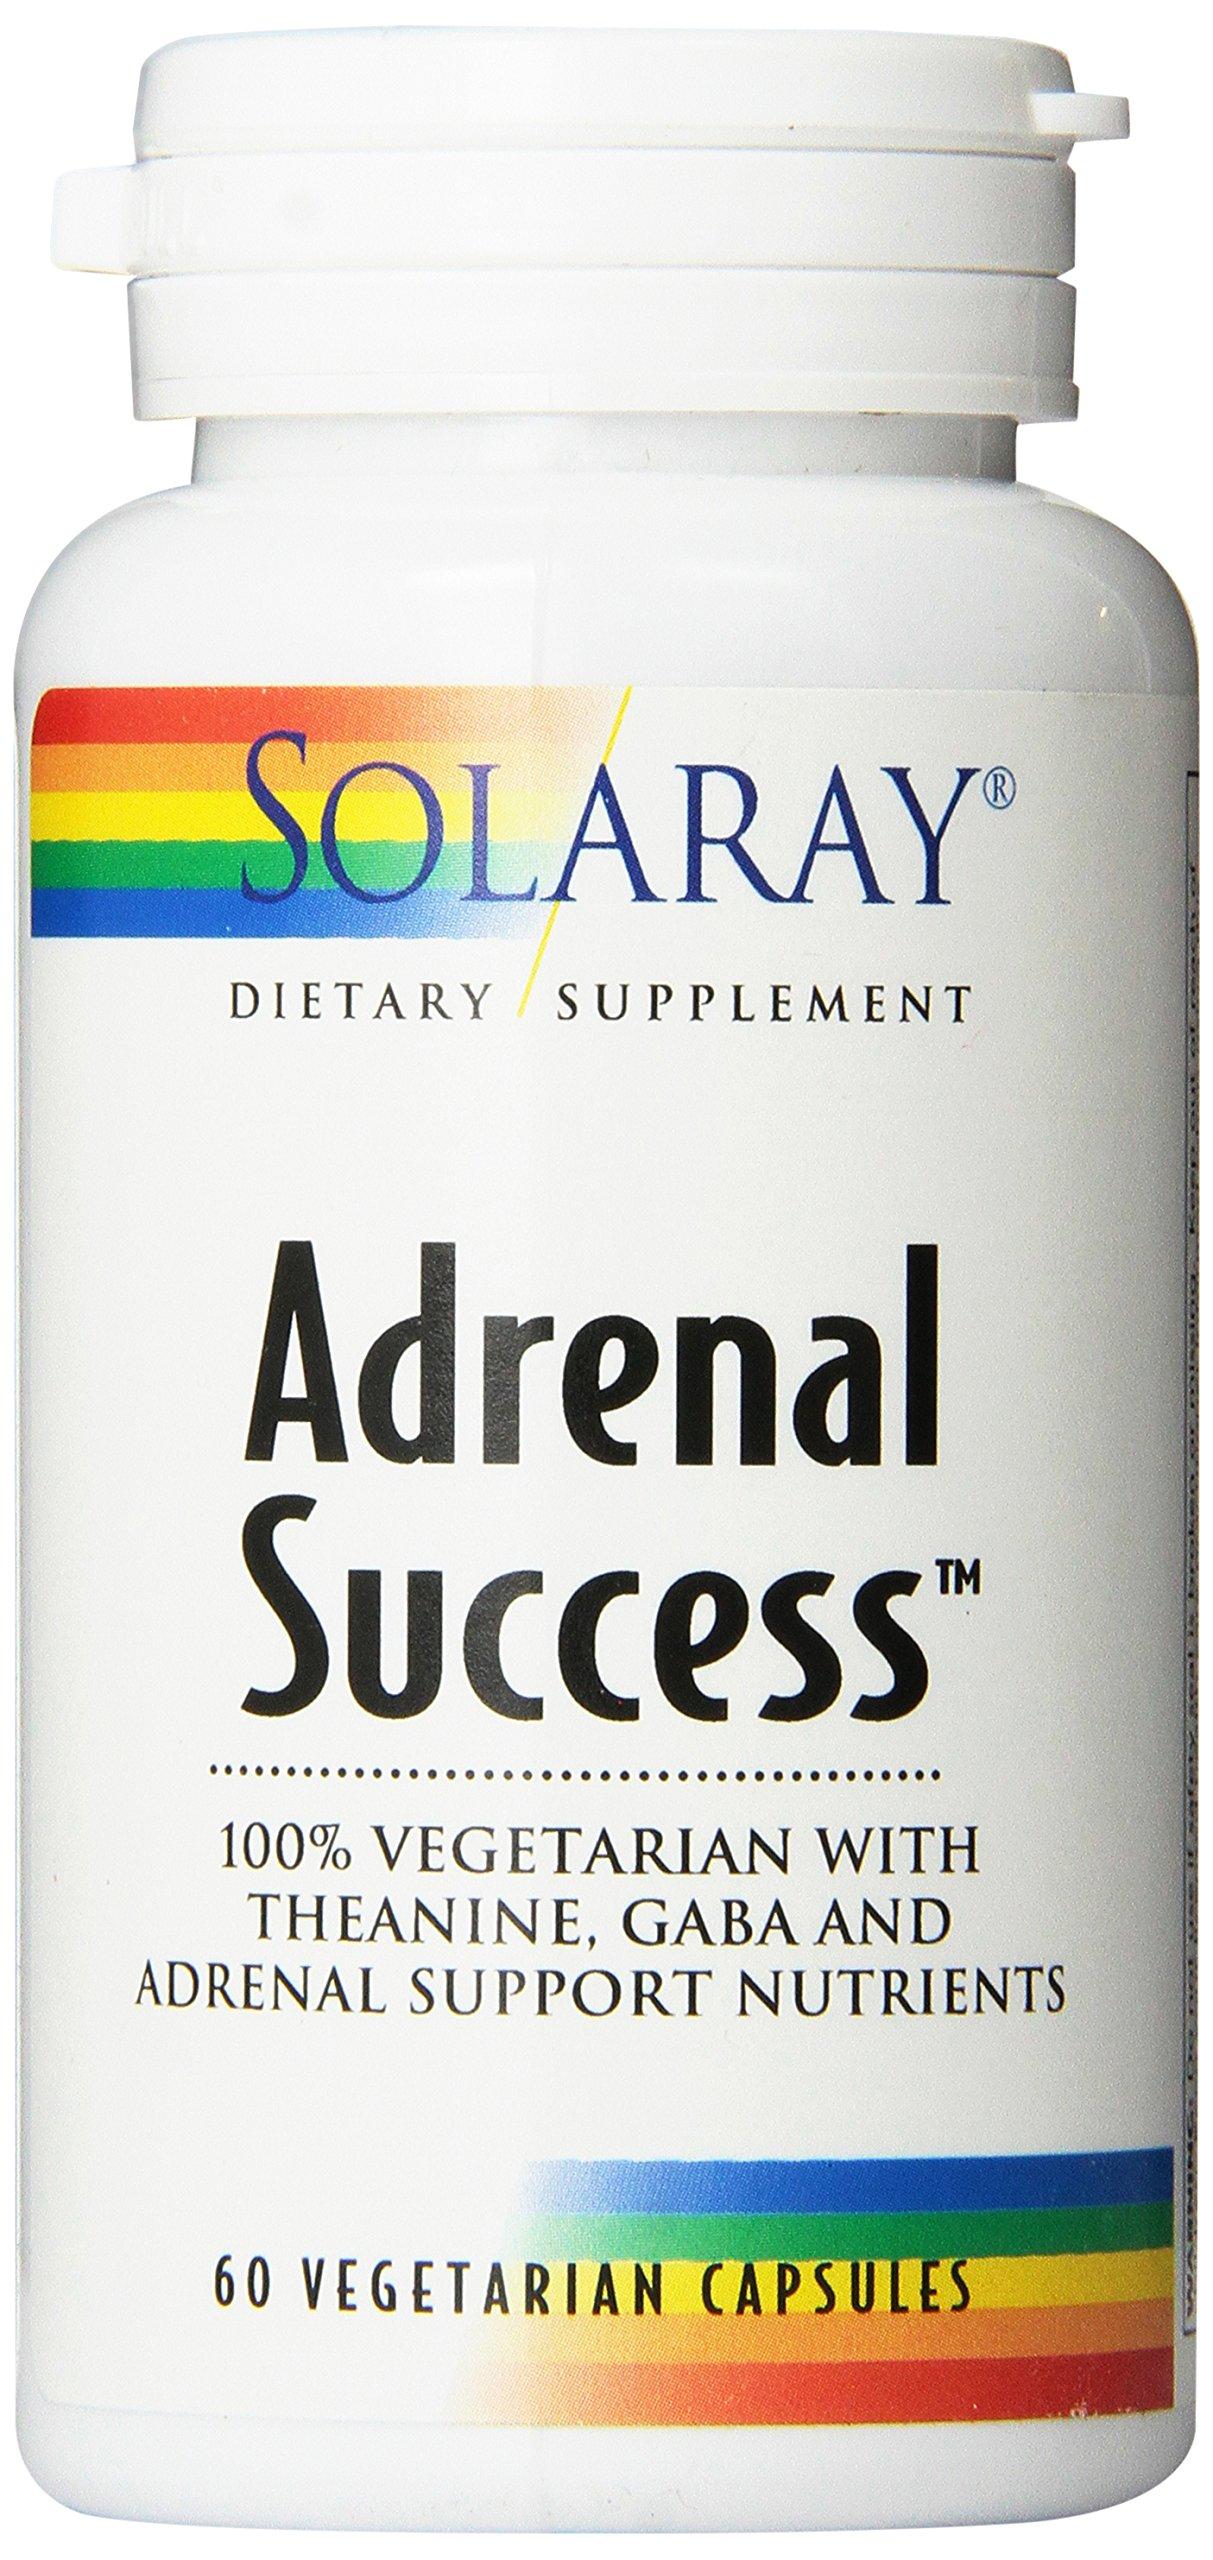 Solaray Adrenal Success Supplement, 60 Count